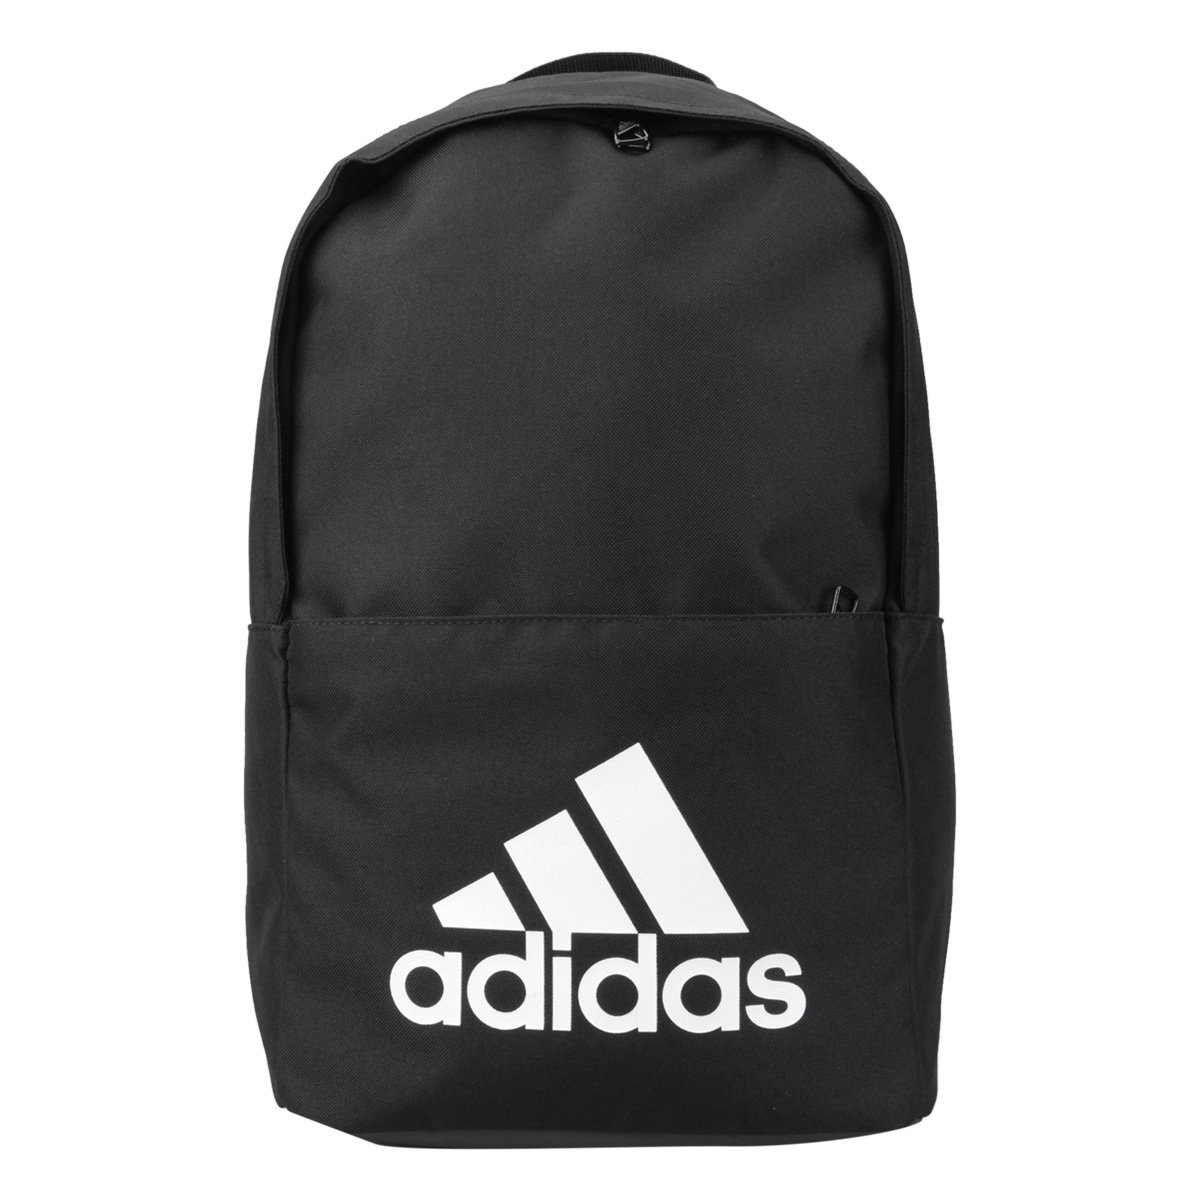 b9a6d5b63c2 Mochila Adidas Classic - Compre Agora